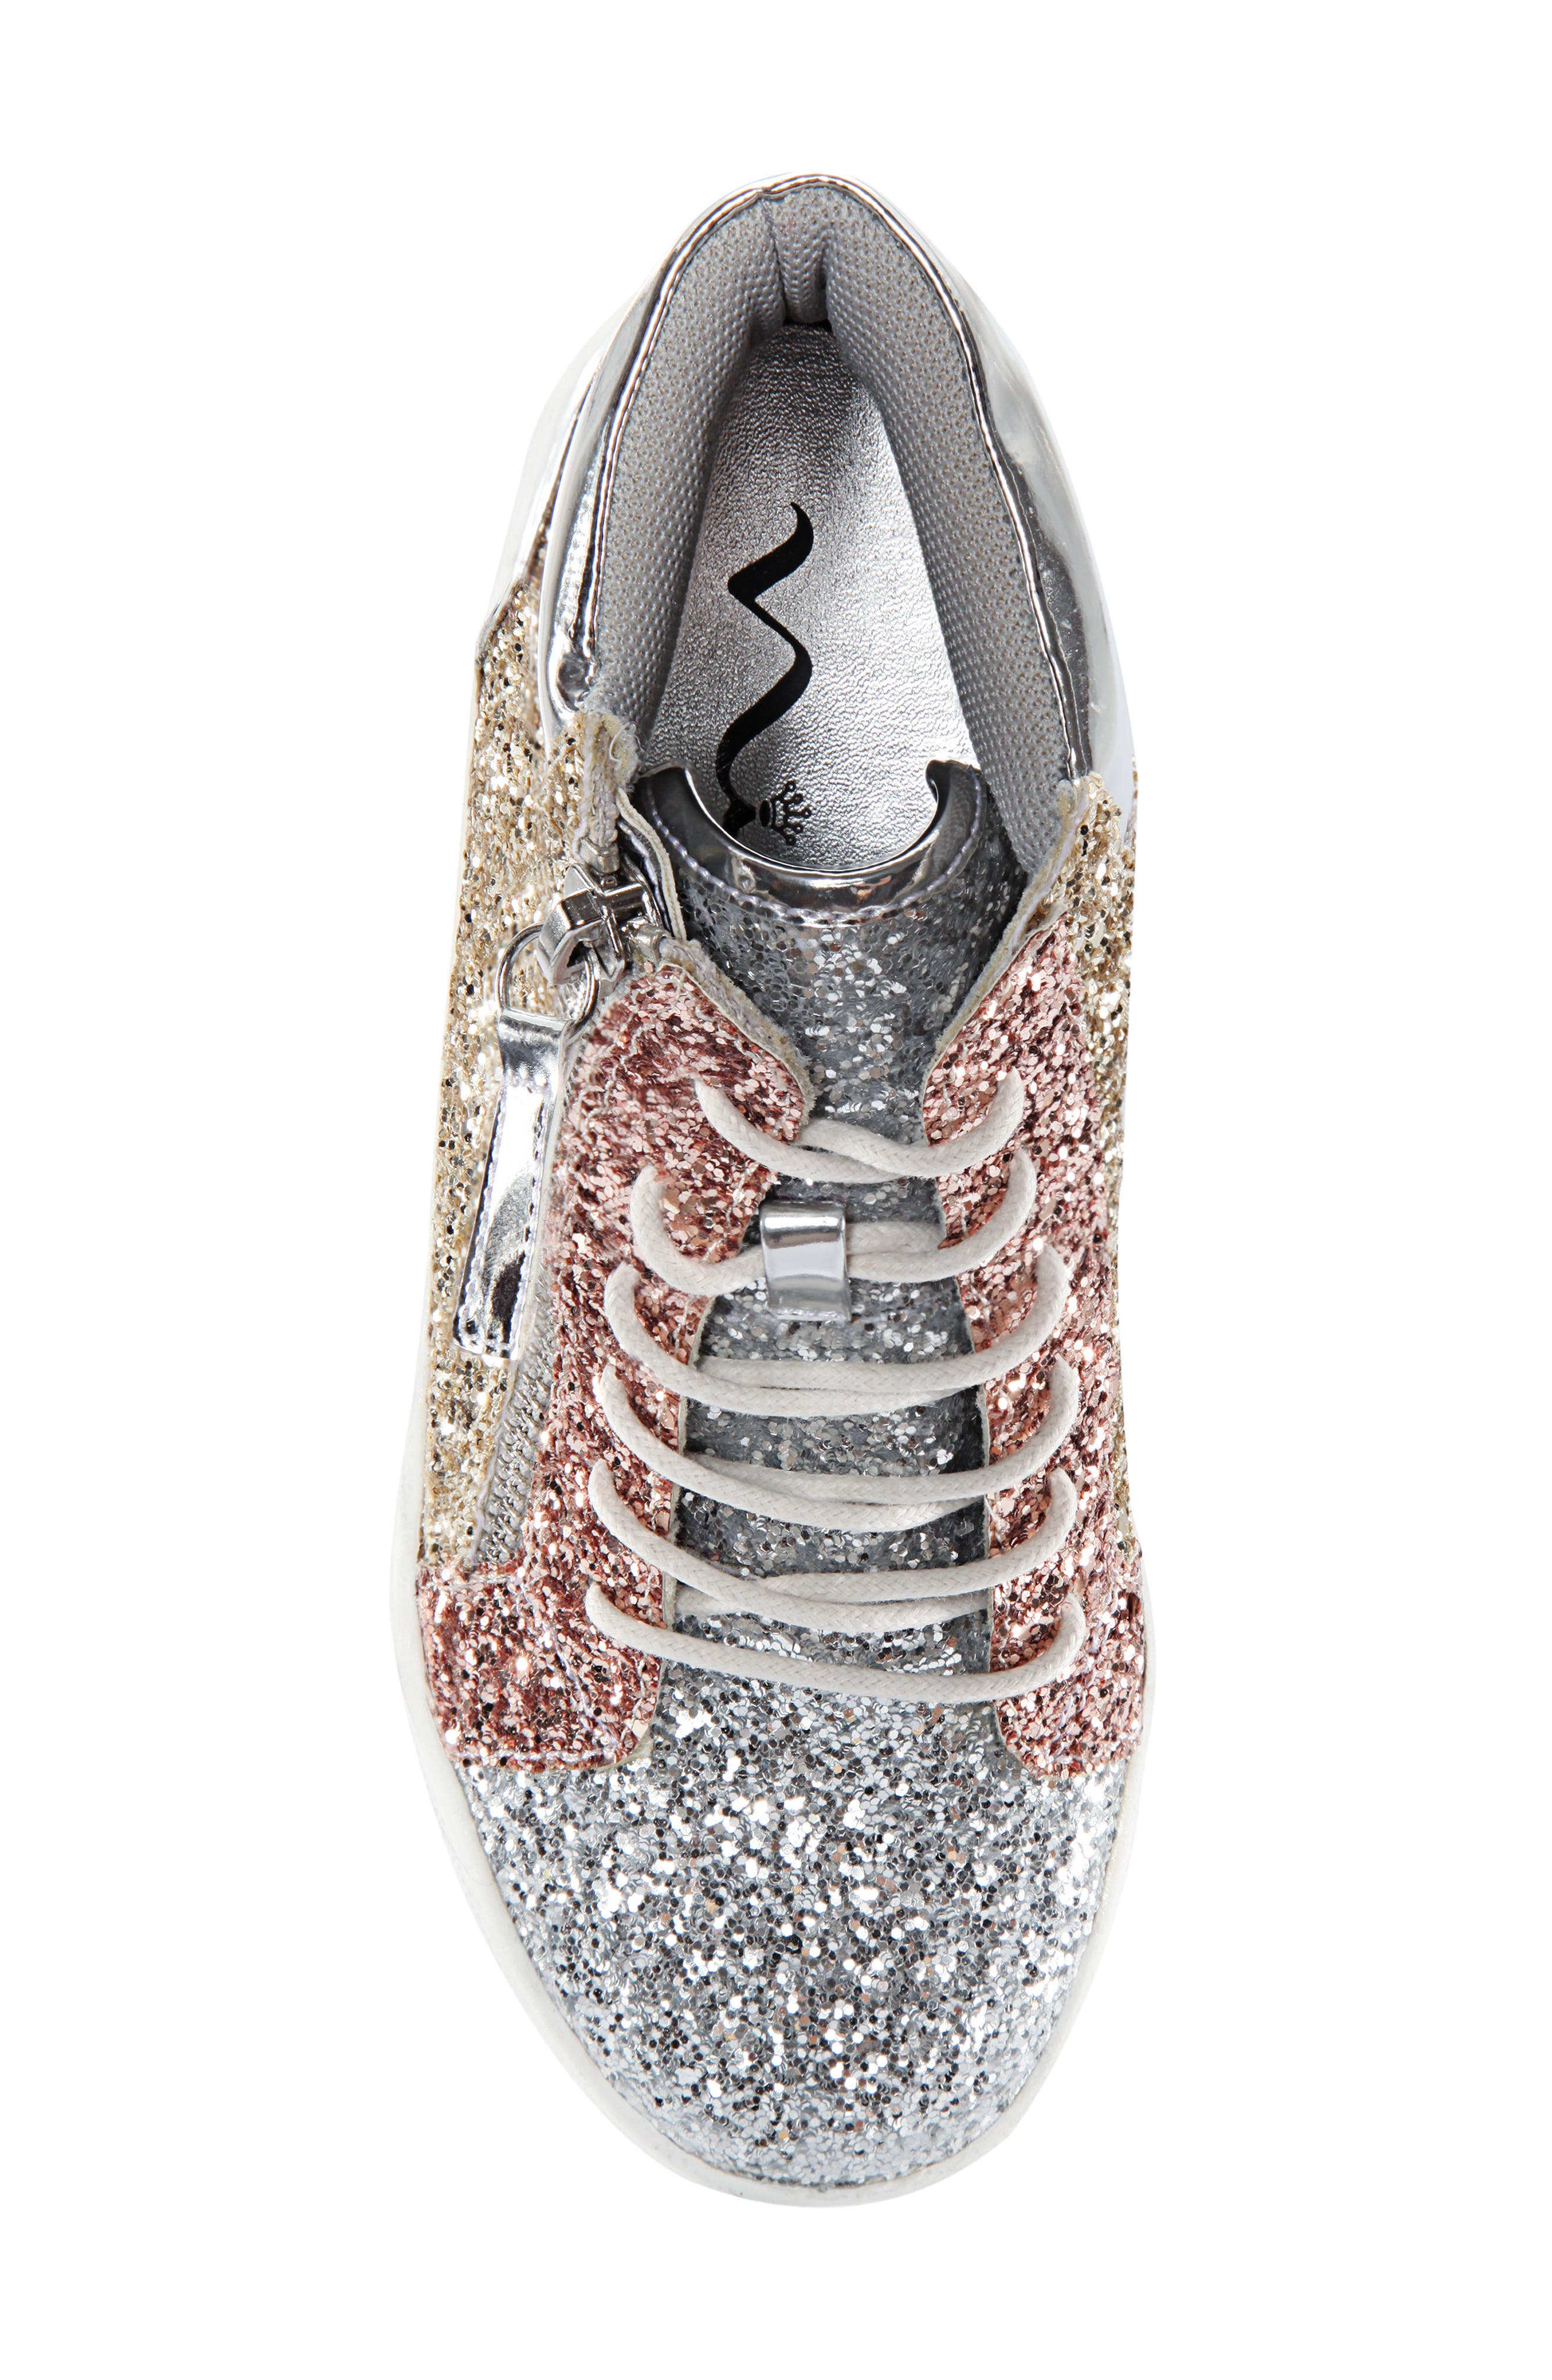 Hylda Glitter High Top Sneaker,                             Alternate thumbnail 5, color,                             SILVER MULTI GLITTER/ PATENT